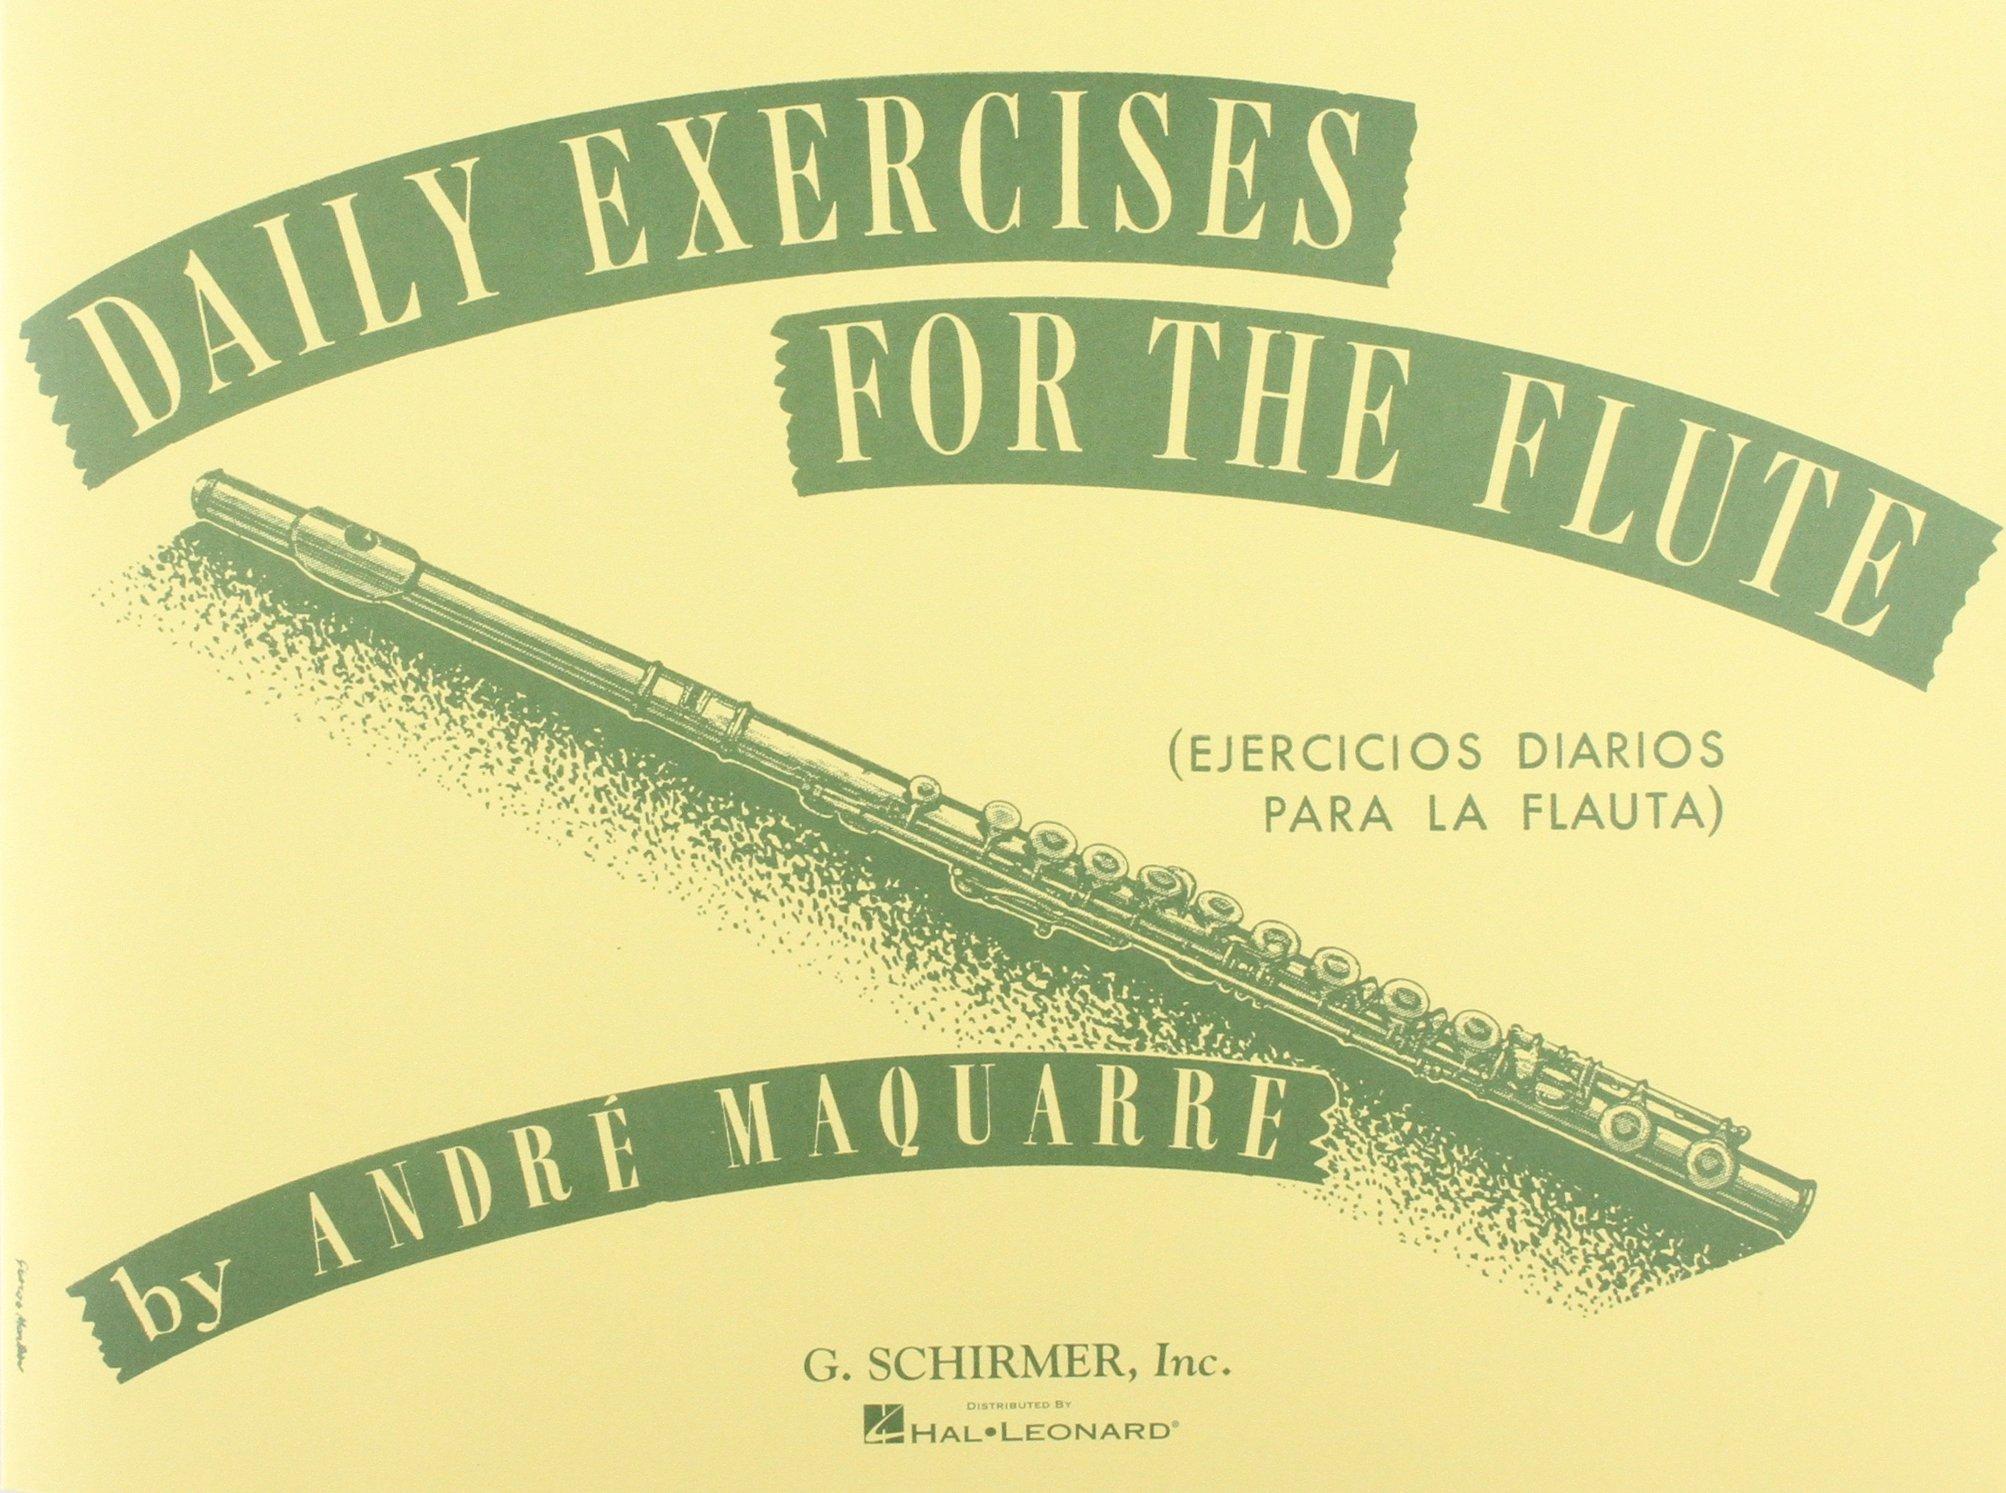 Daily Exercises for the Flute/Ejercicios diarios para la flauta (Spanish Edition)